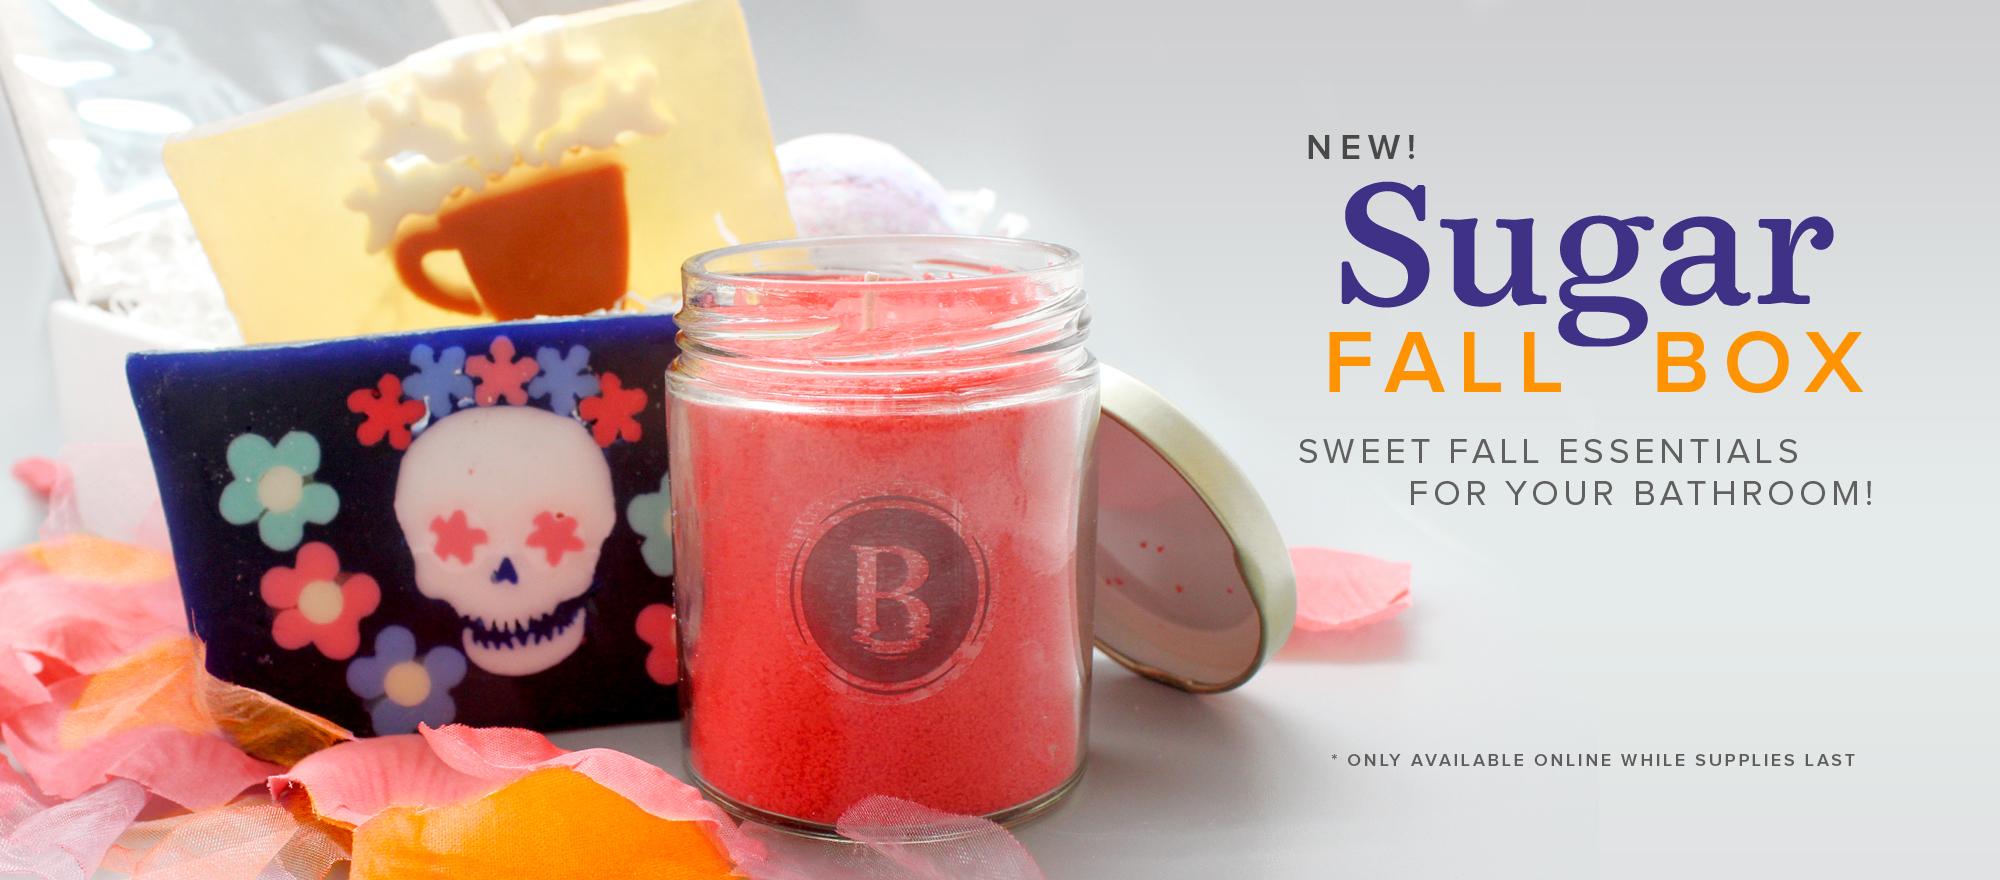 NEW! Sugar Fall Box